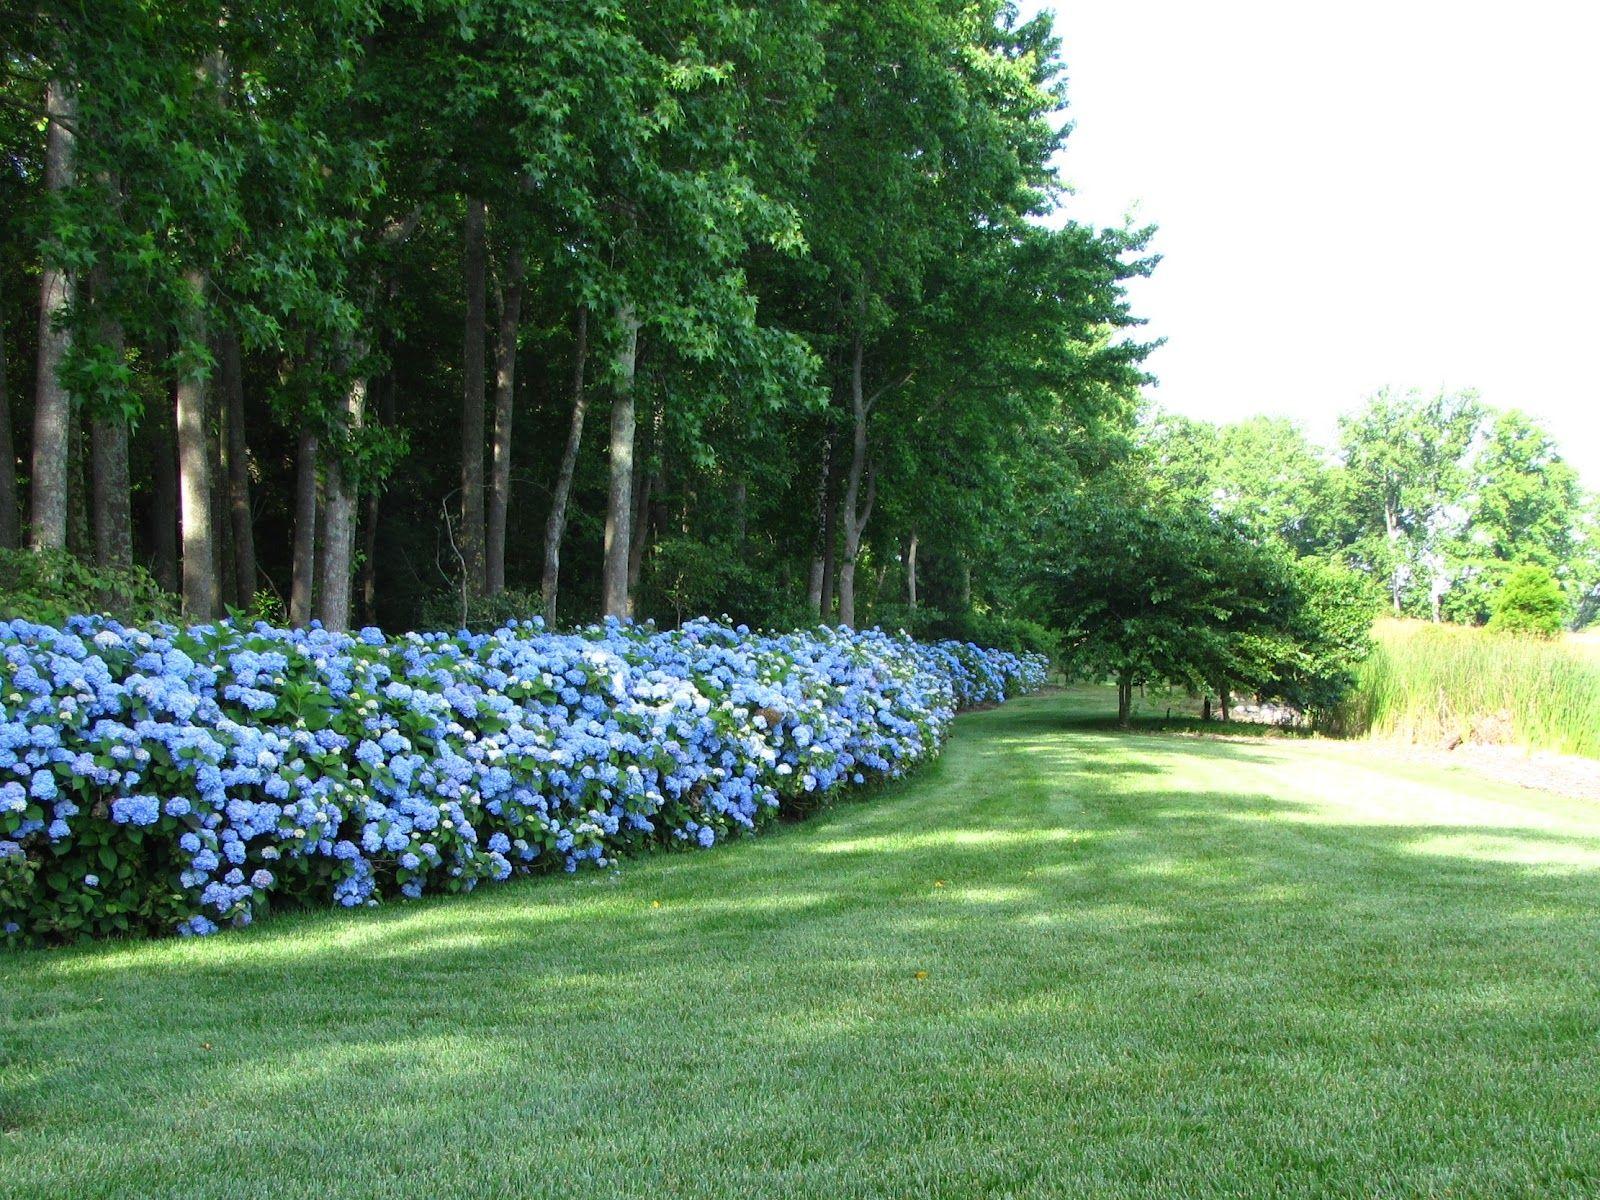 Hydrangea Fence Line Shade Landscaping Garden Shrubs